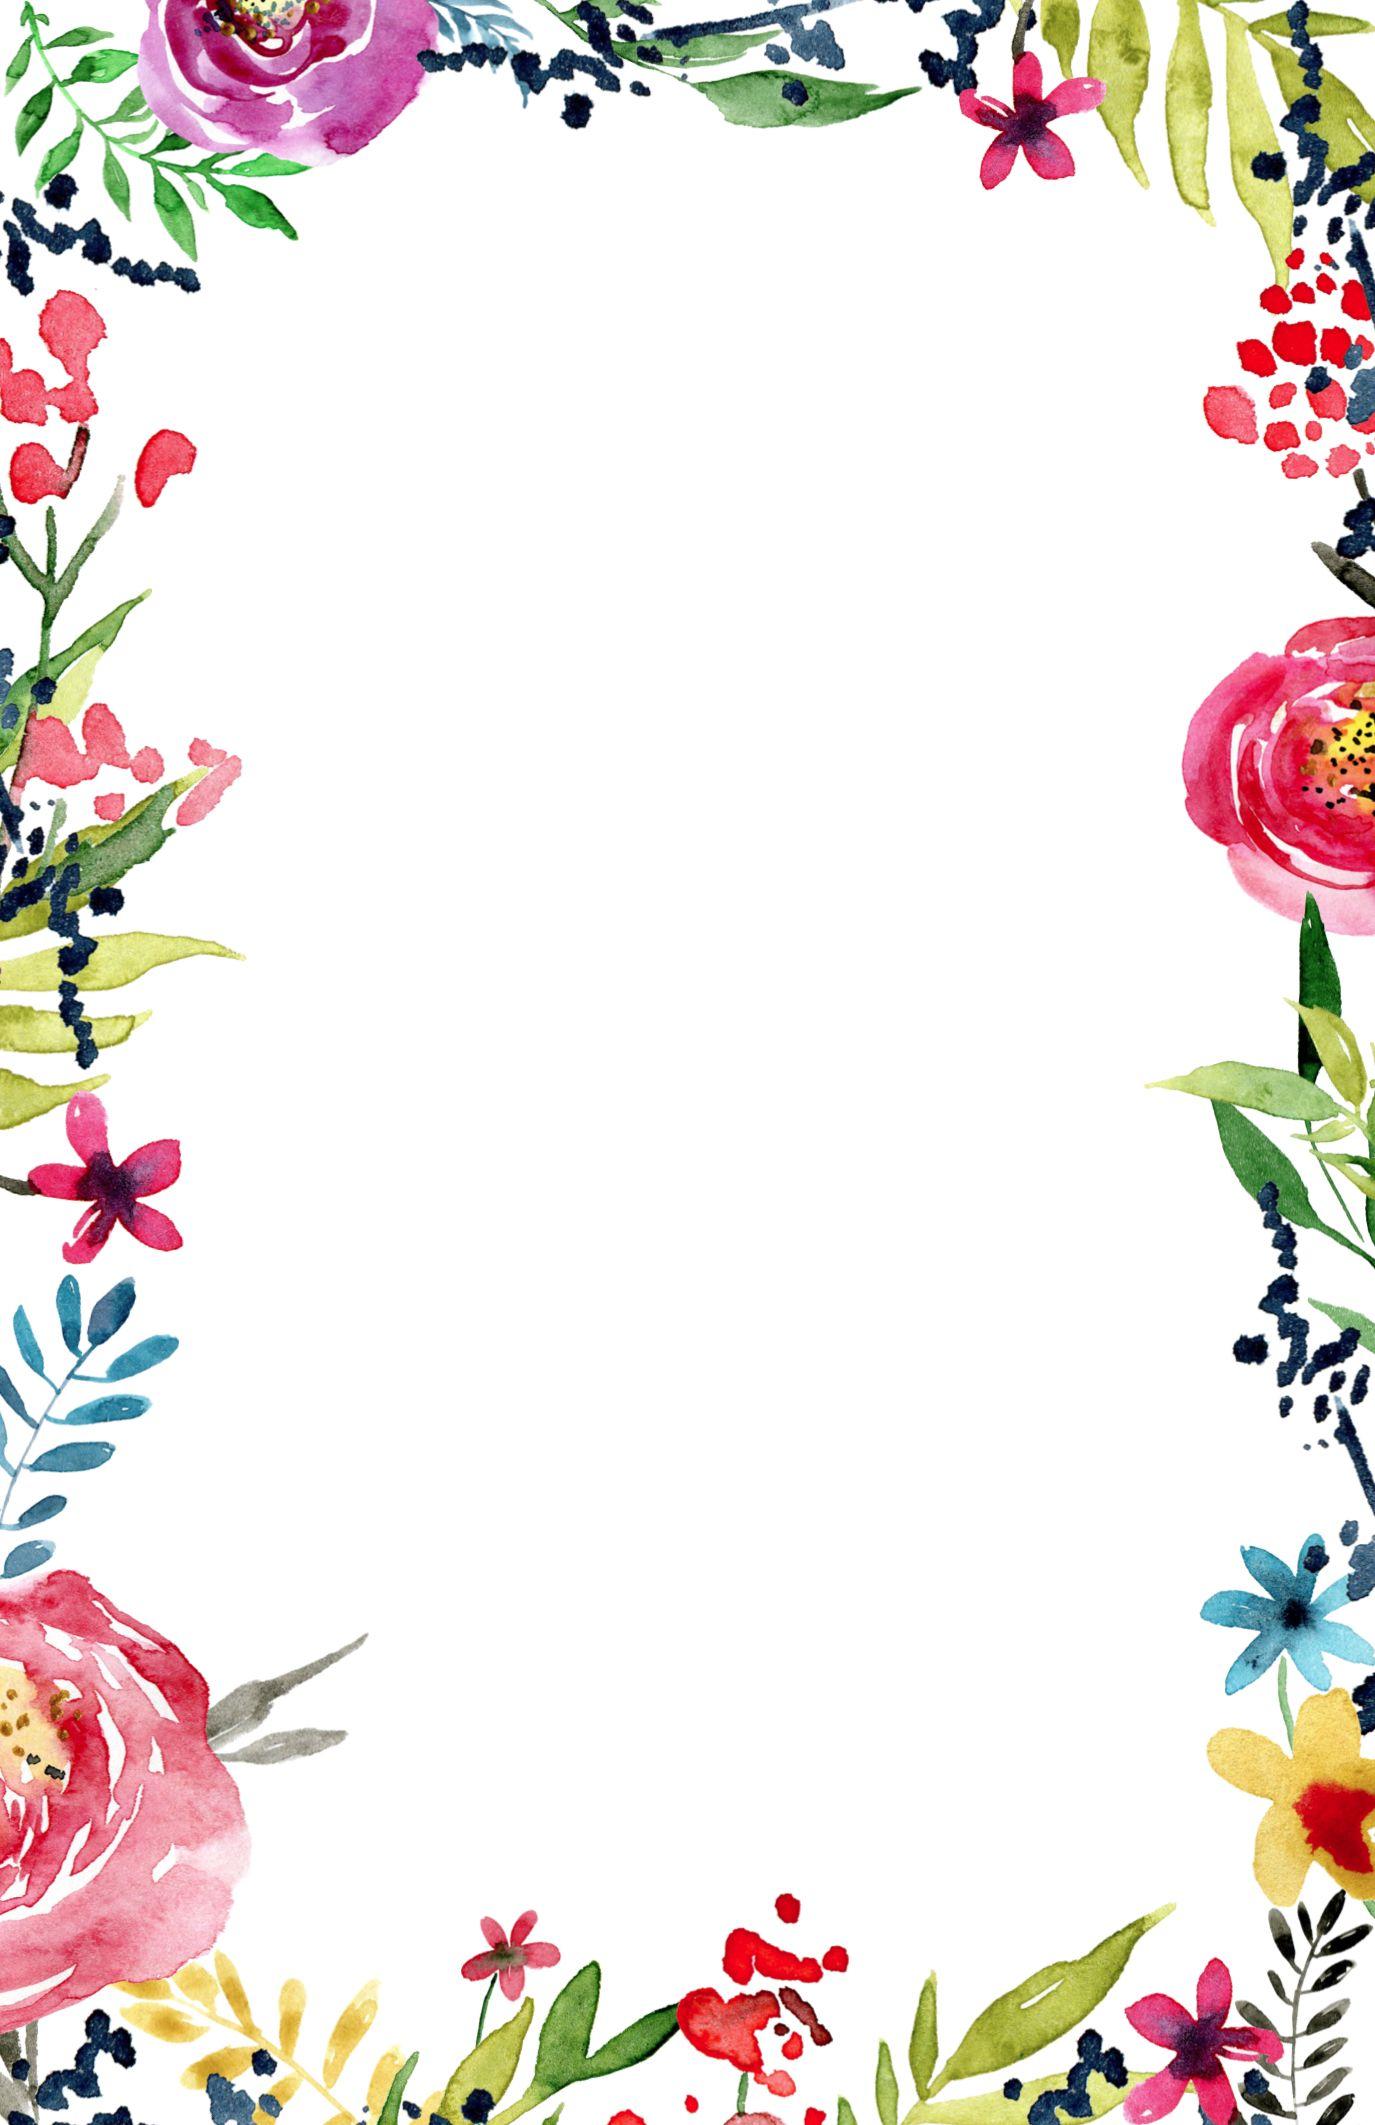 Invitacion invitacion pinterest content wallpaper and watercolor